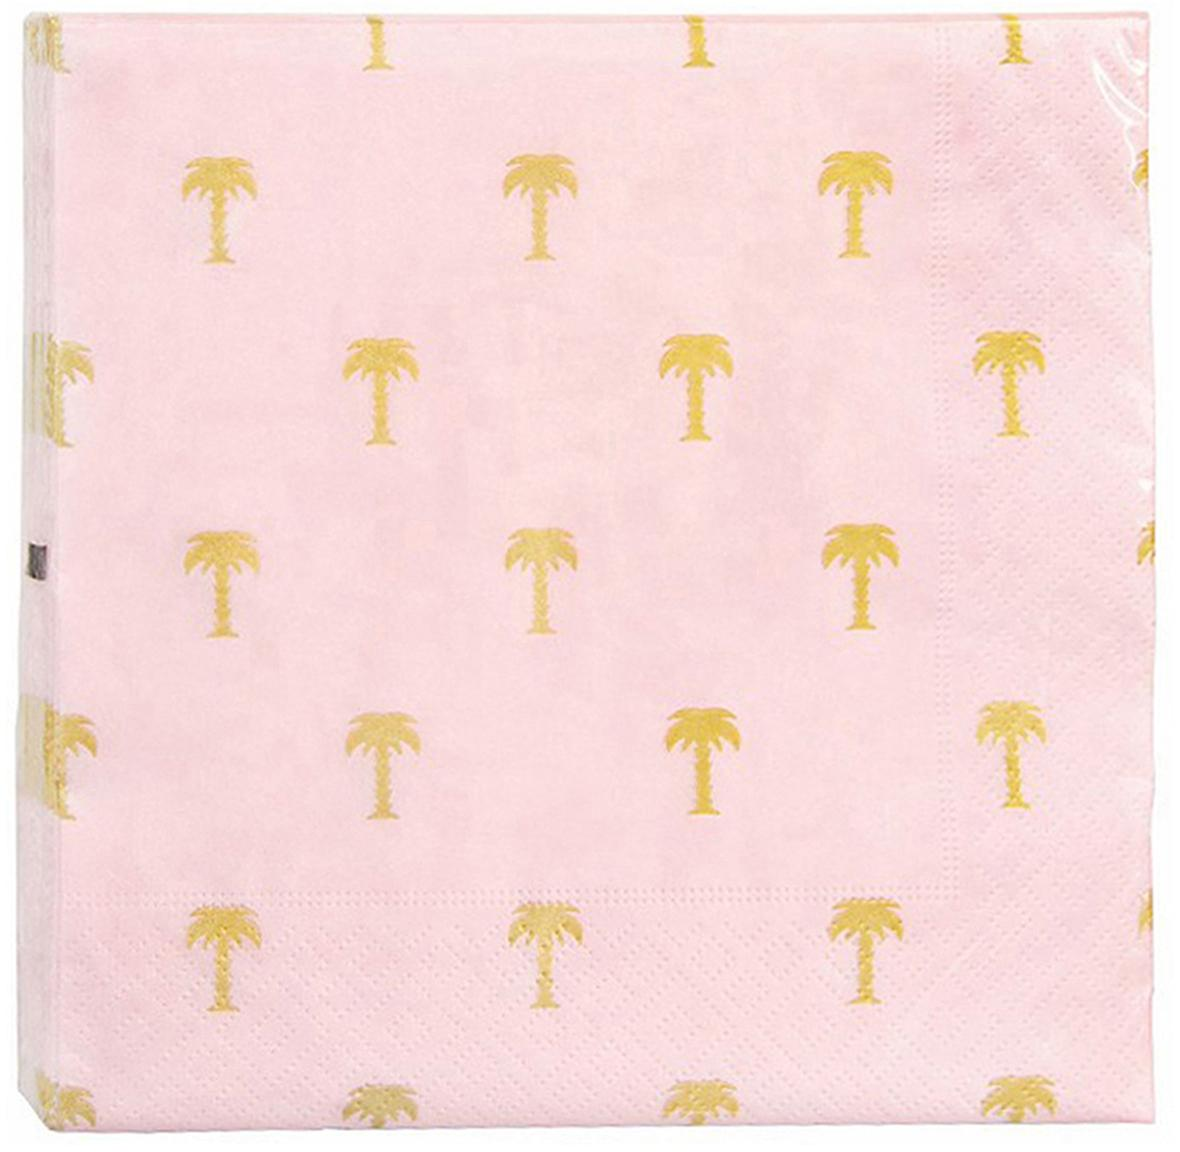 Servilletas de papel Palmtree, 20uds., Papel, Rosa, dorado, An 17 x L 17 cm